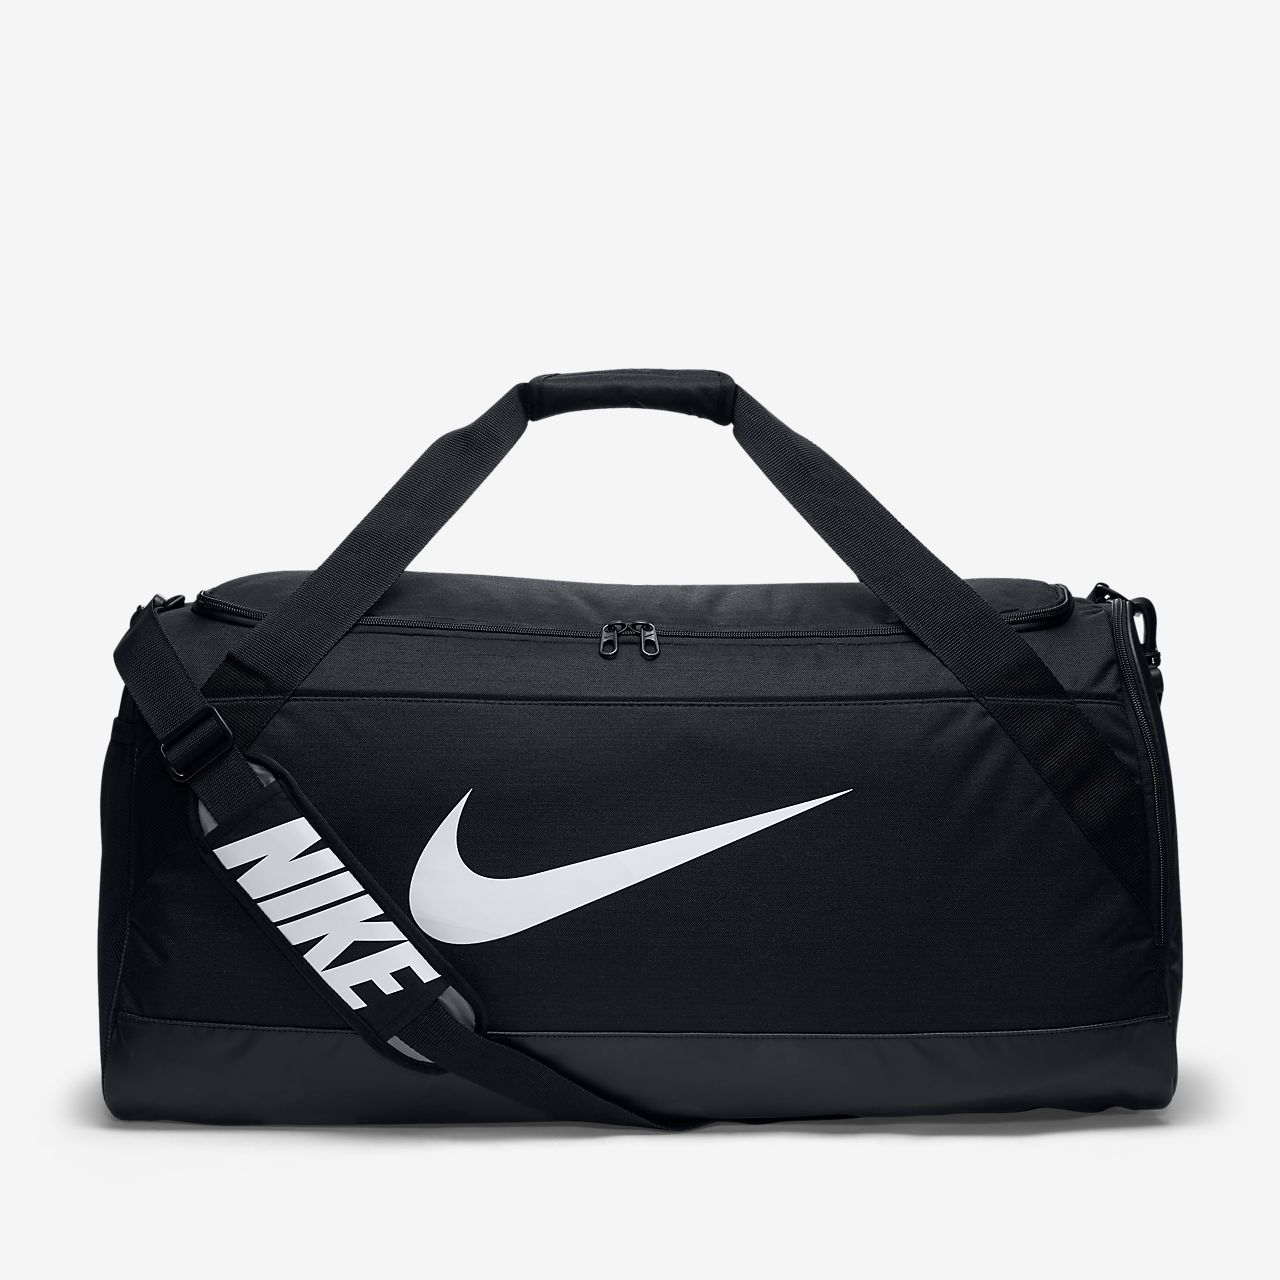 876494b0e Bolso de lona de entrenamiento Nike Brasilia (grande). Nike.com MX